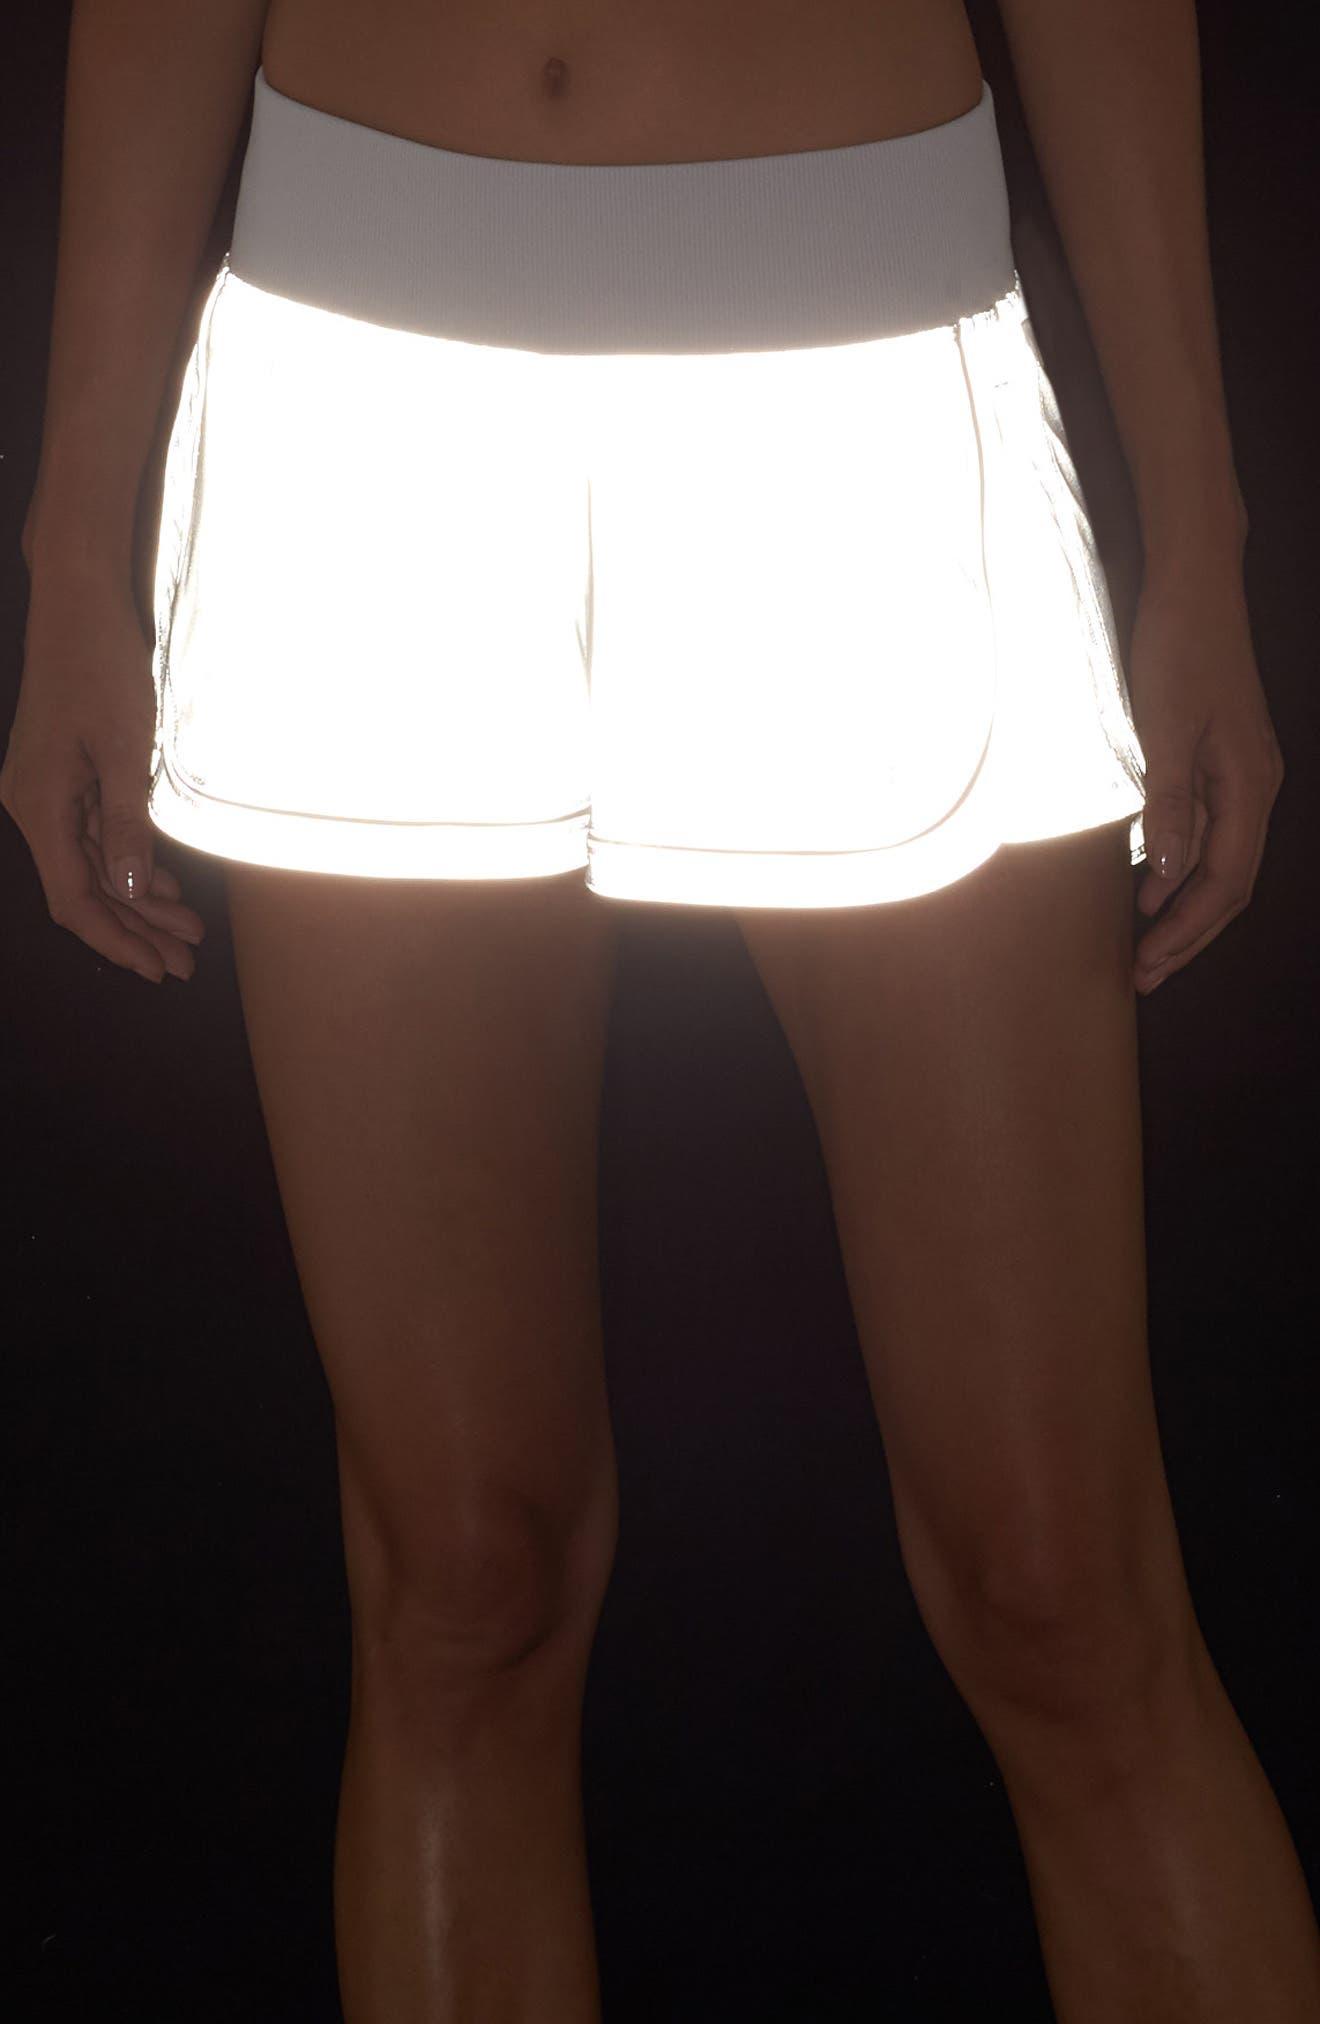 Reflective Meditate Shorts,                             Alternate thumbnail 6, color,                             Silver Reflective